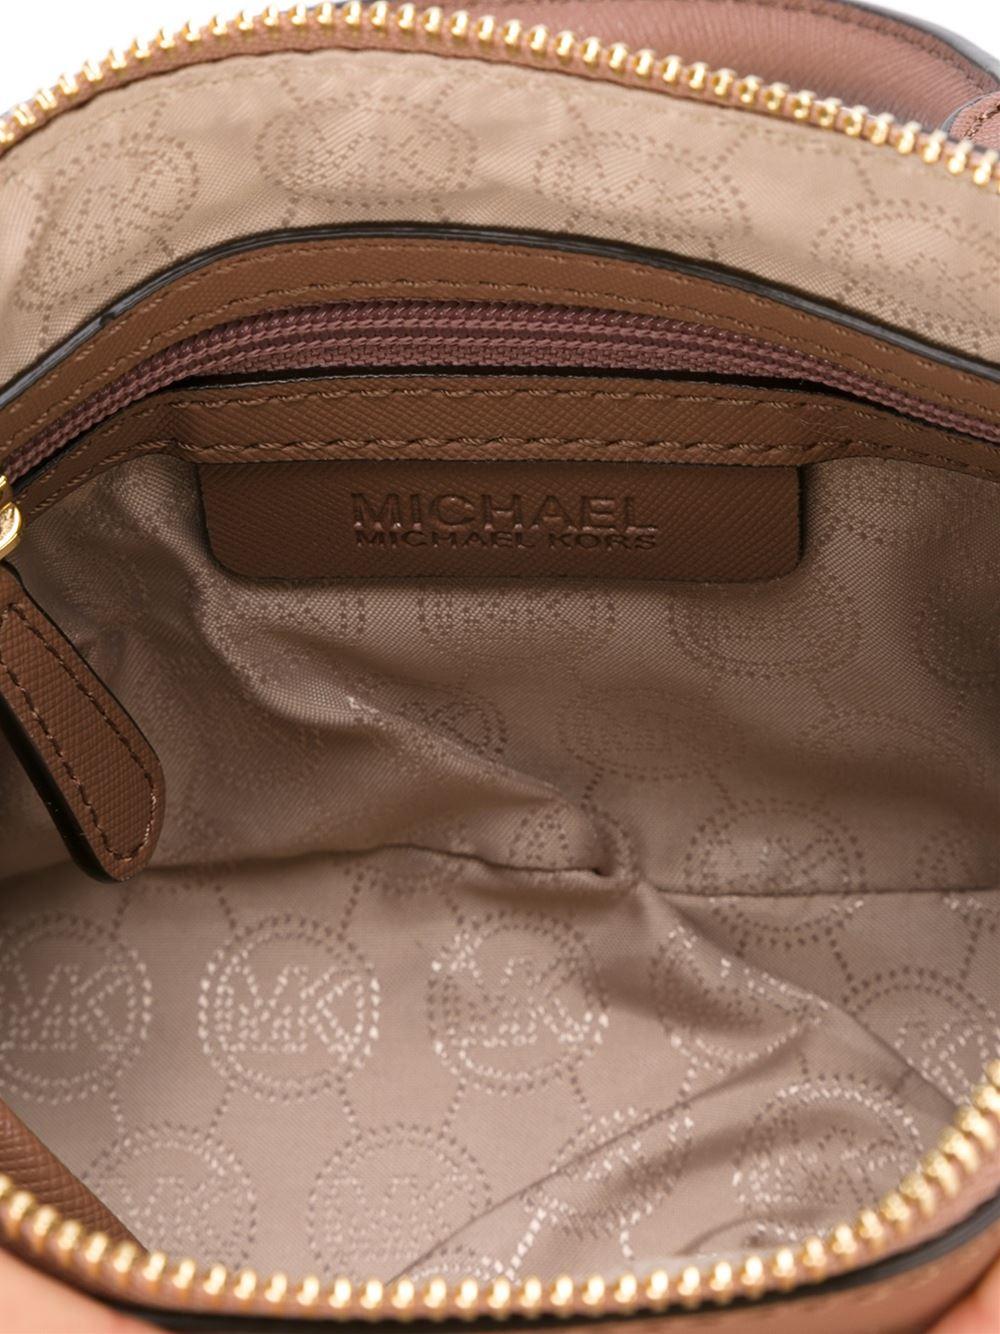 0b2909aec330 ... Michael Michael Kors Mini cindy Crossbody Bag in Pink - Lyst ...